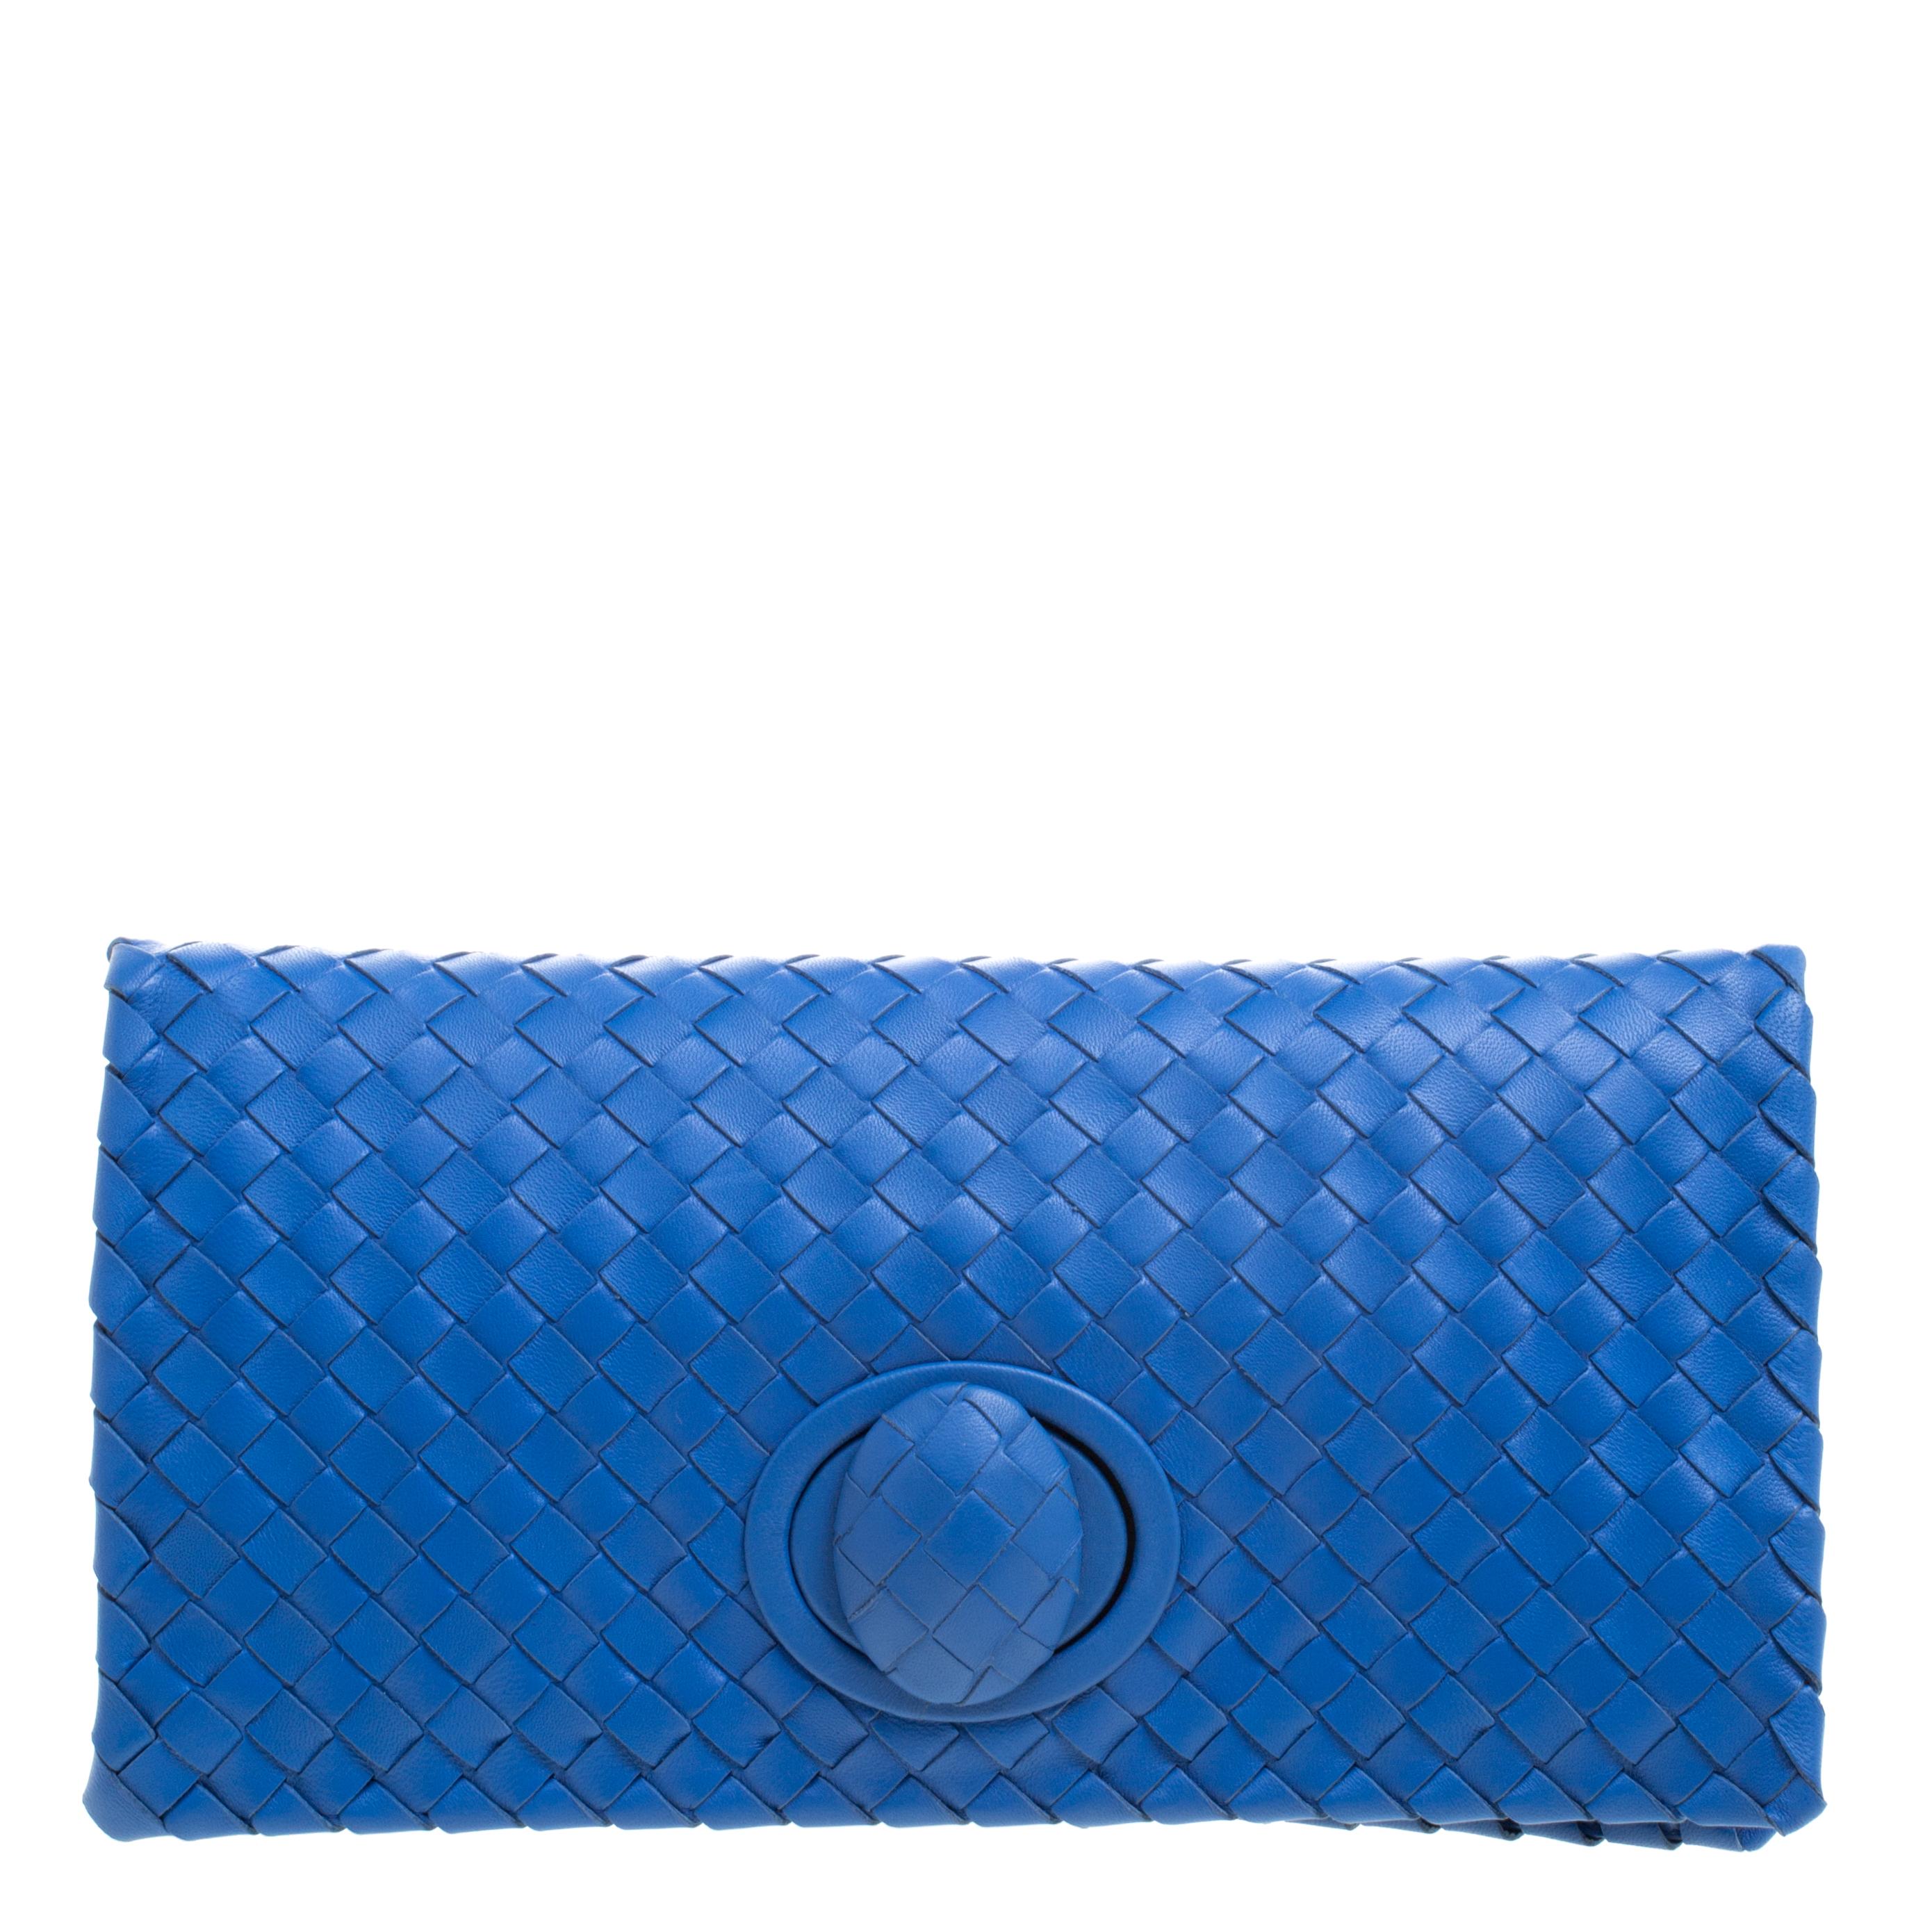 610d6a127ee1 ... Bottega Veneta Blue Intrecciato Leather Twist Lock Clutch. nextprev.  prevnext